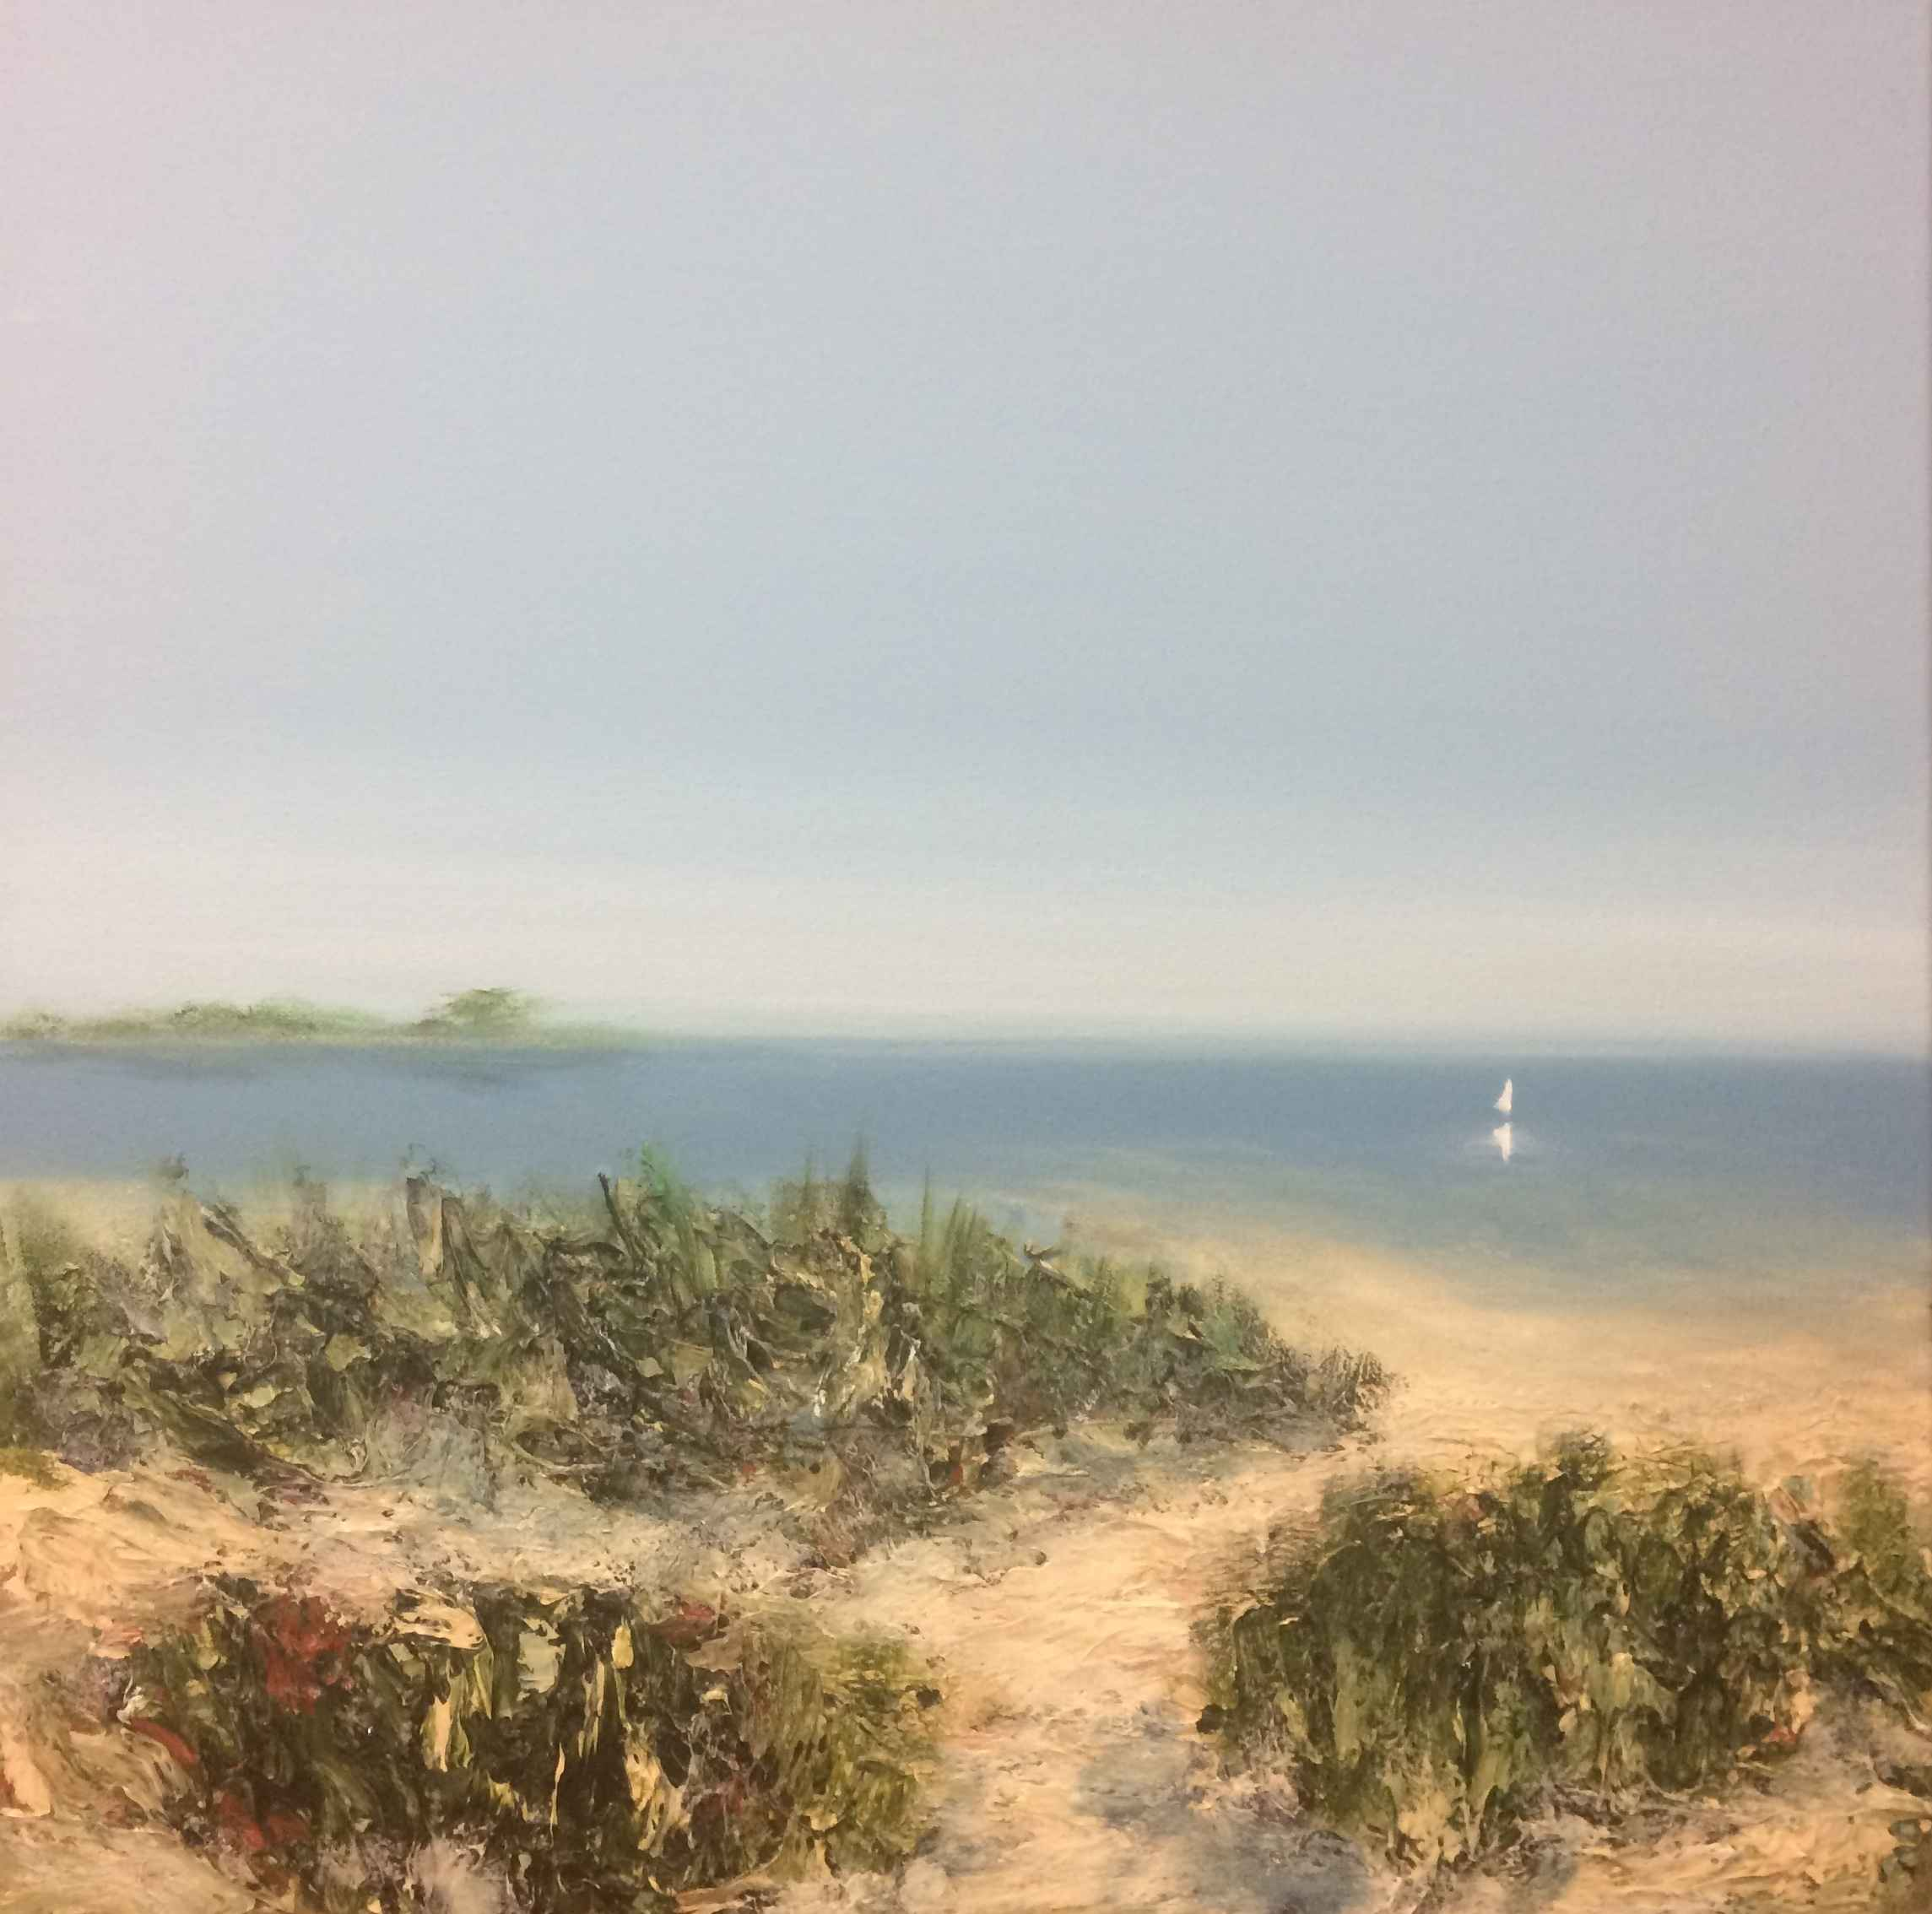 June Sail #2 by  Steve Lyons - Masterpiece Online